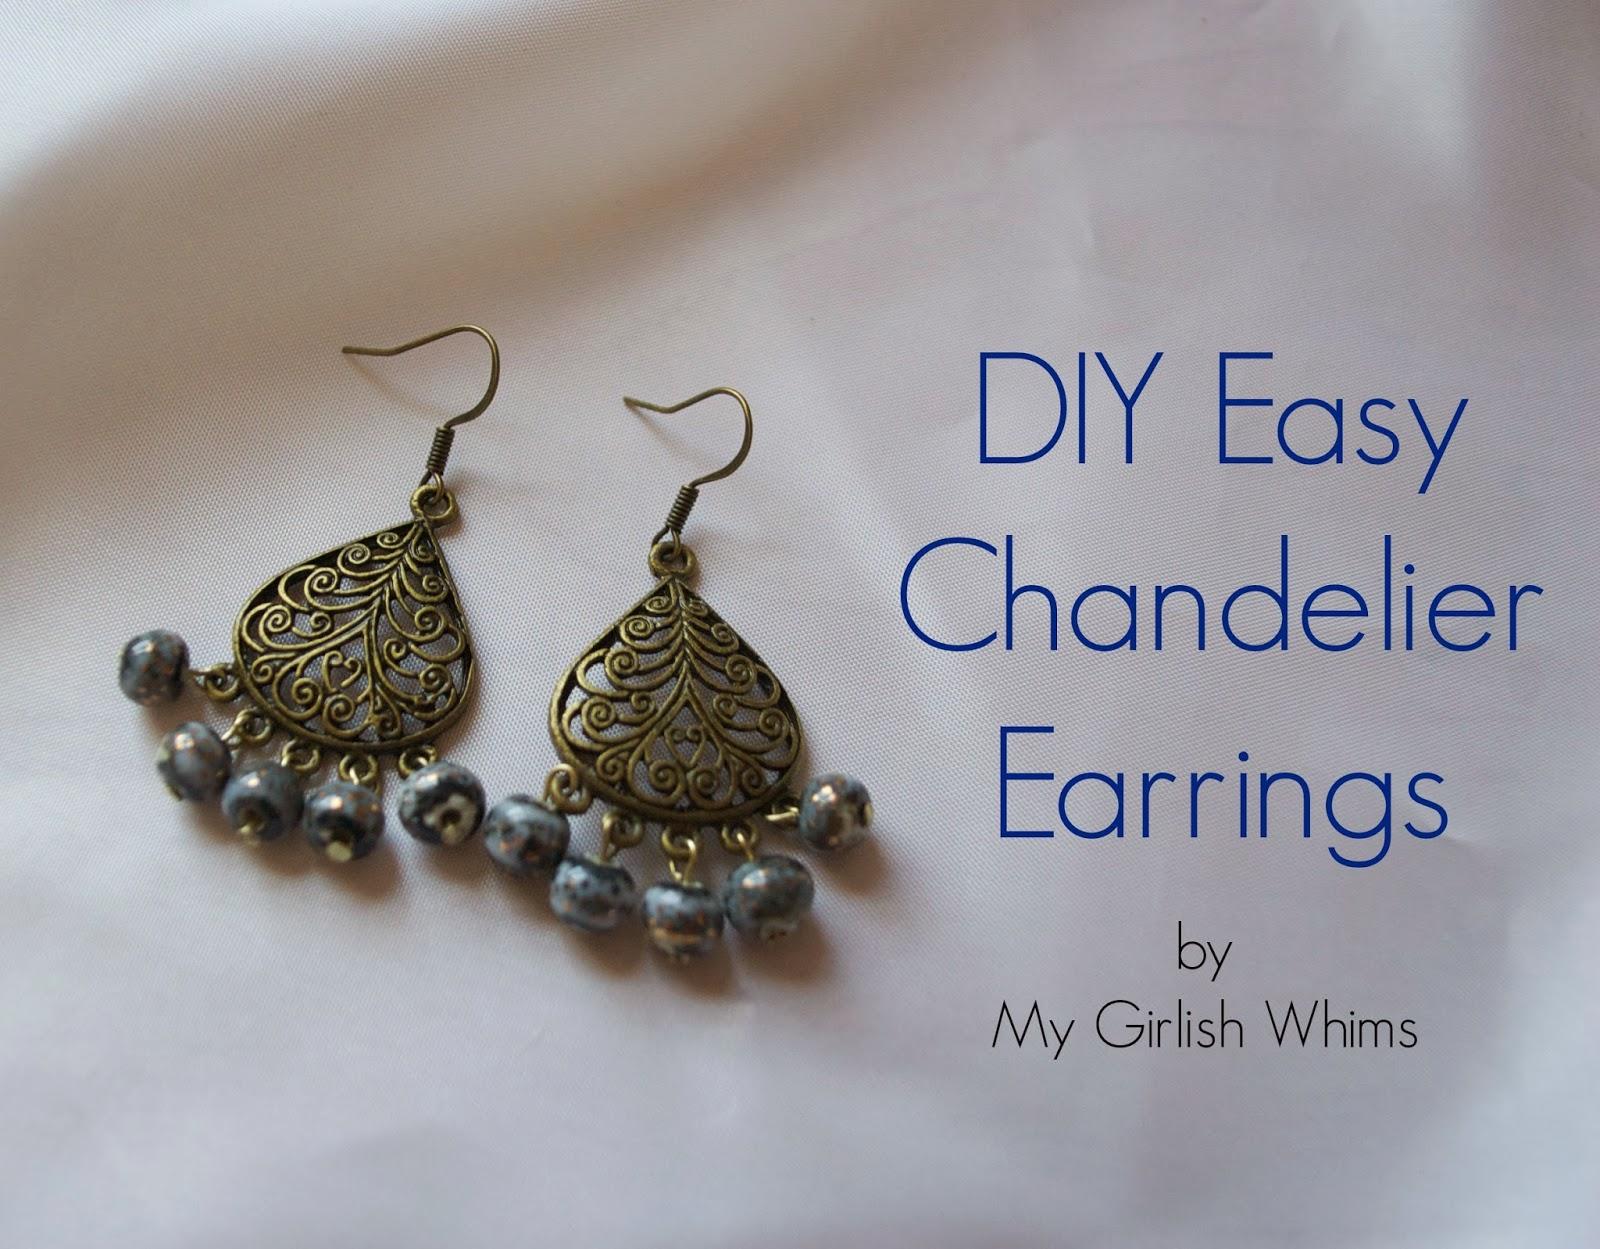 Diy easy chandelier earrings my girlish whims diy easy chandelier earrings aloadofball Choice Image